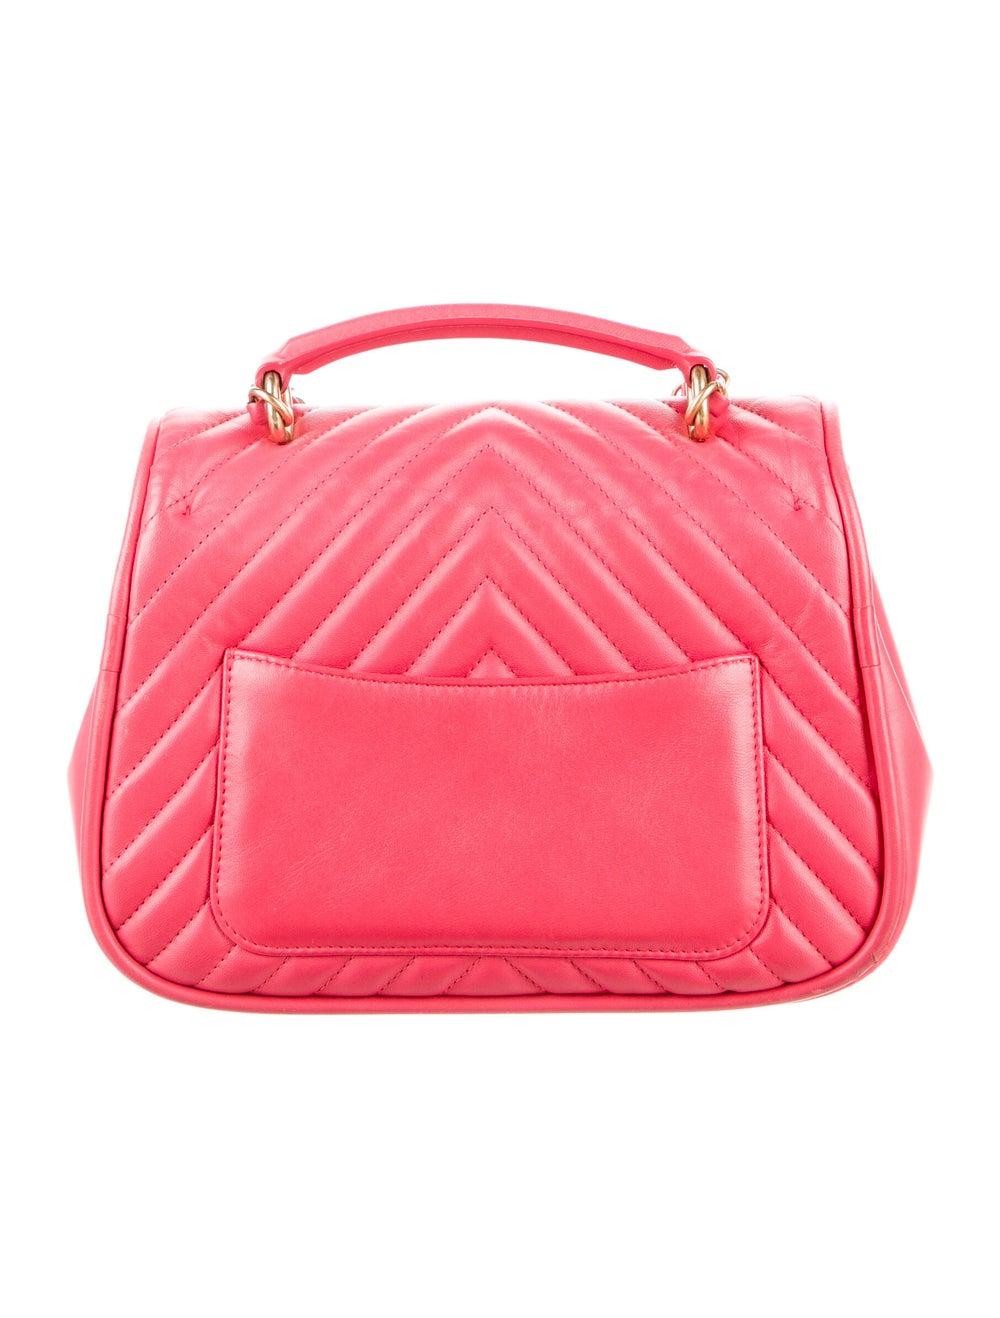 Chanel Reversed Chevron Bag Pink - image 4